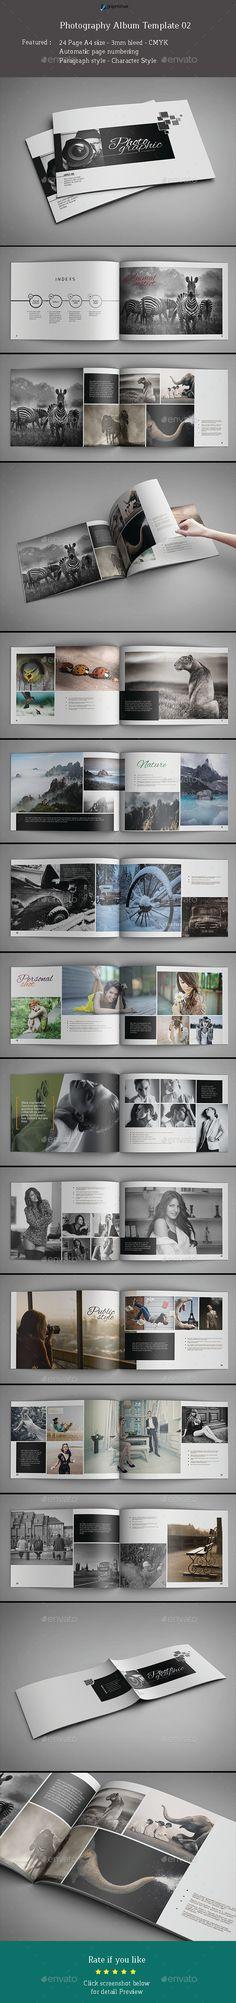 New Design Layout Album Ideas Album Design, Photography Portfolio, Book Photography, Template Free, Print Templates, Photo Album Printing, Design Editorial, Booklet Design, Picture Albums